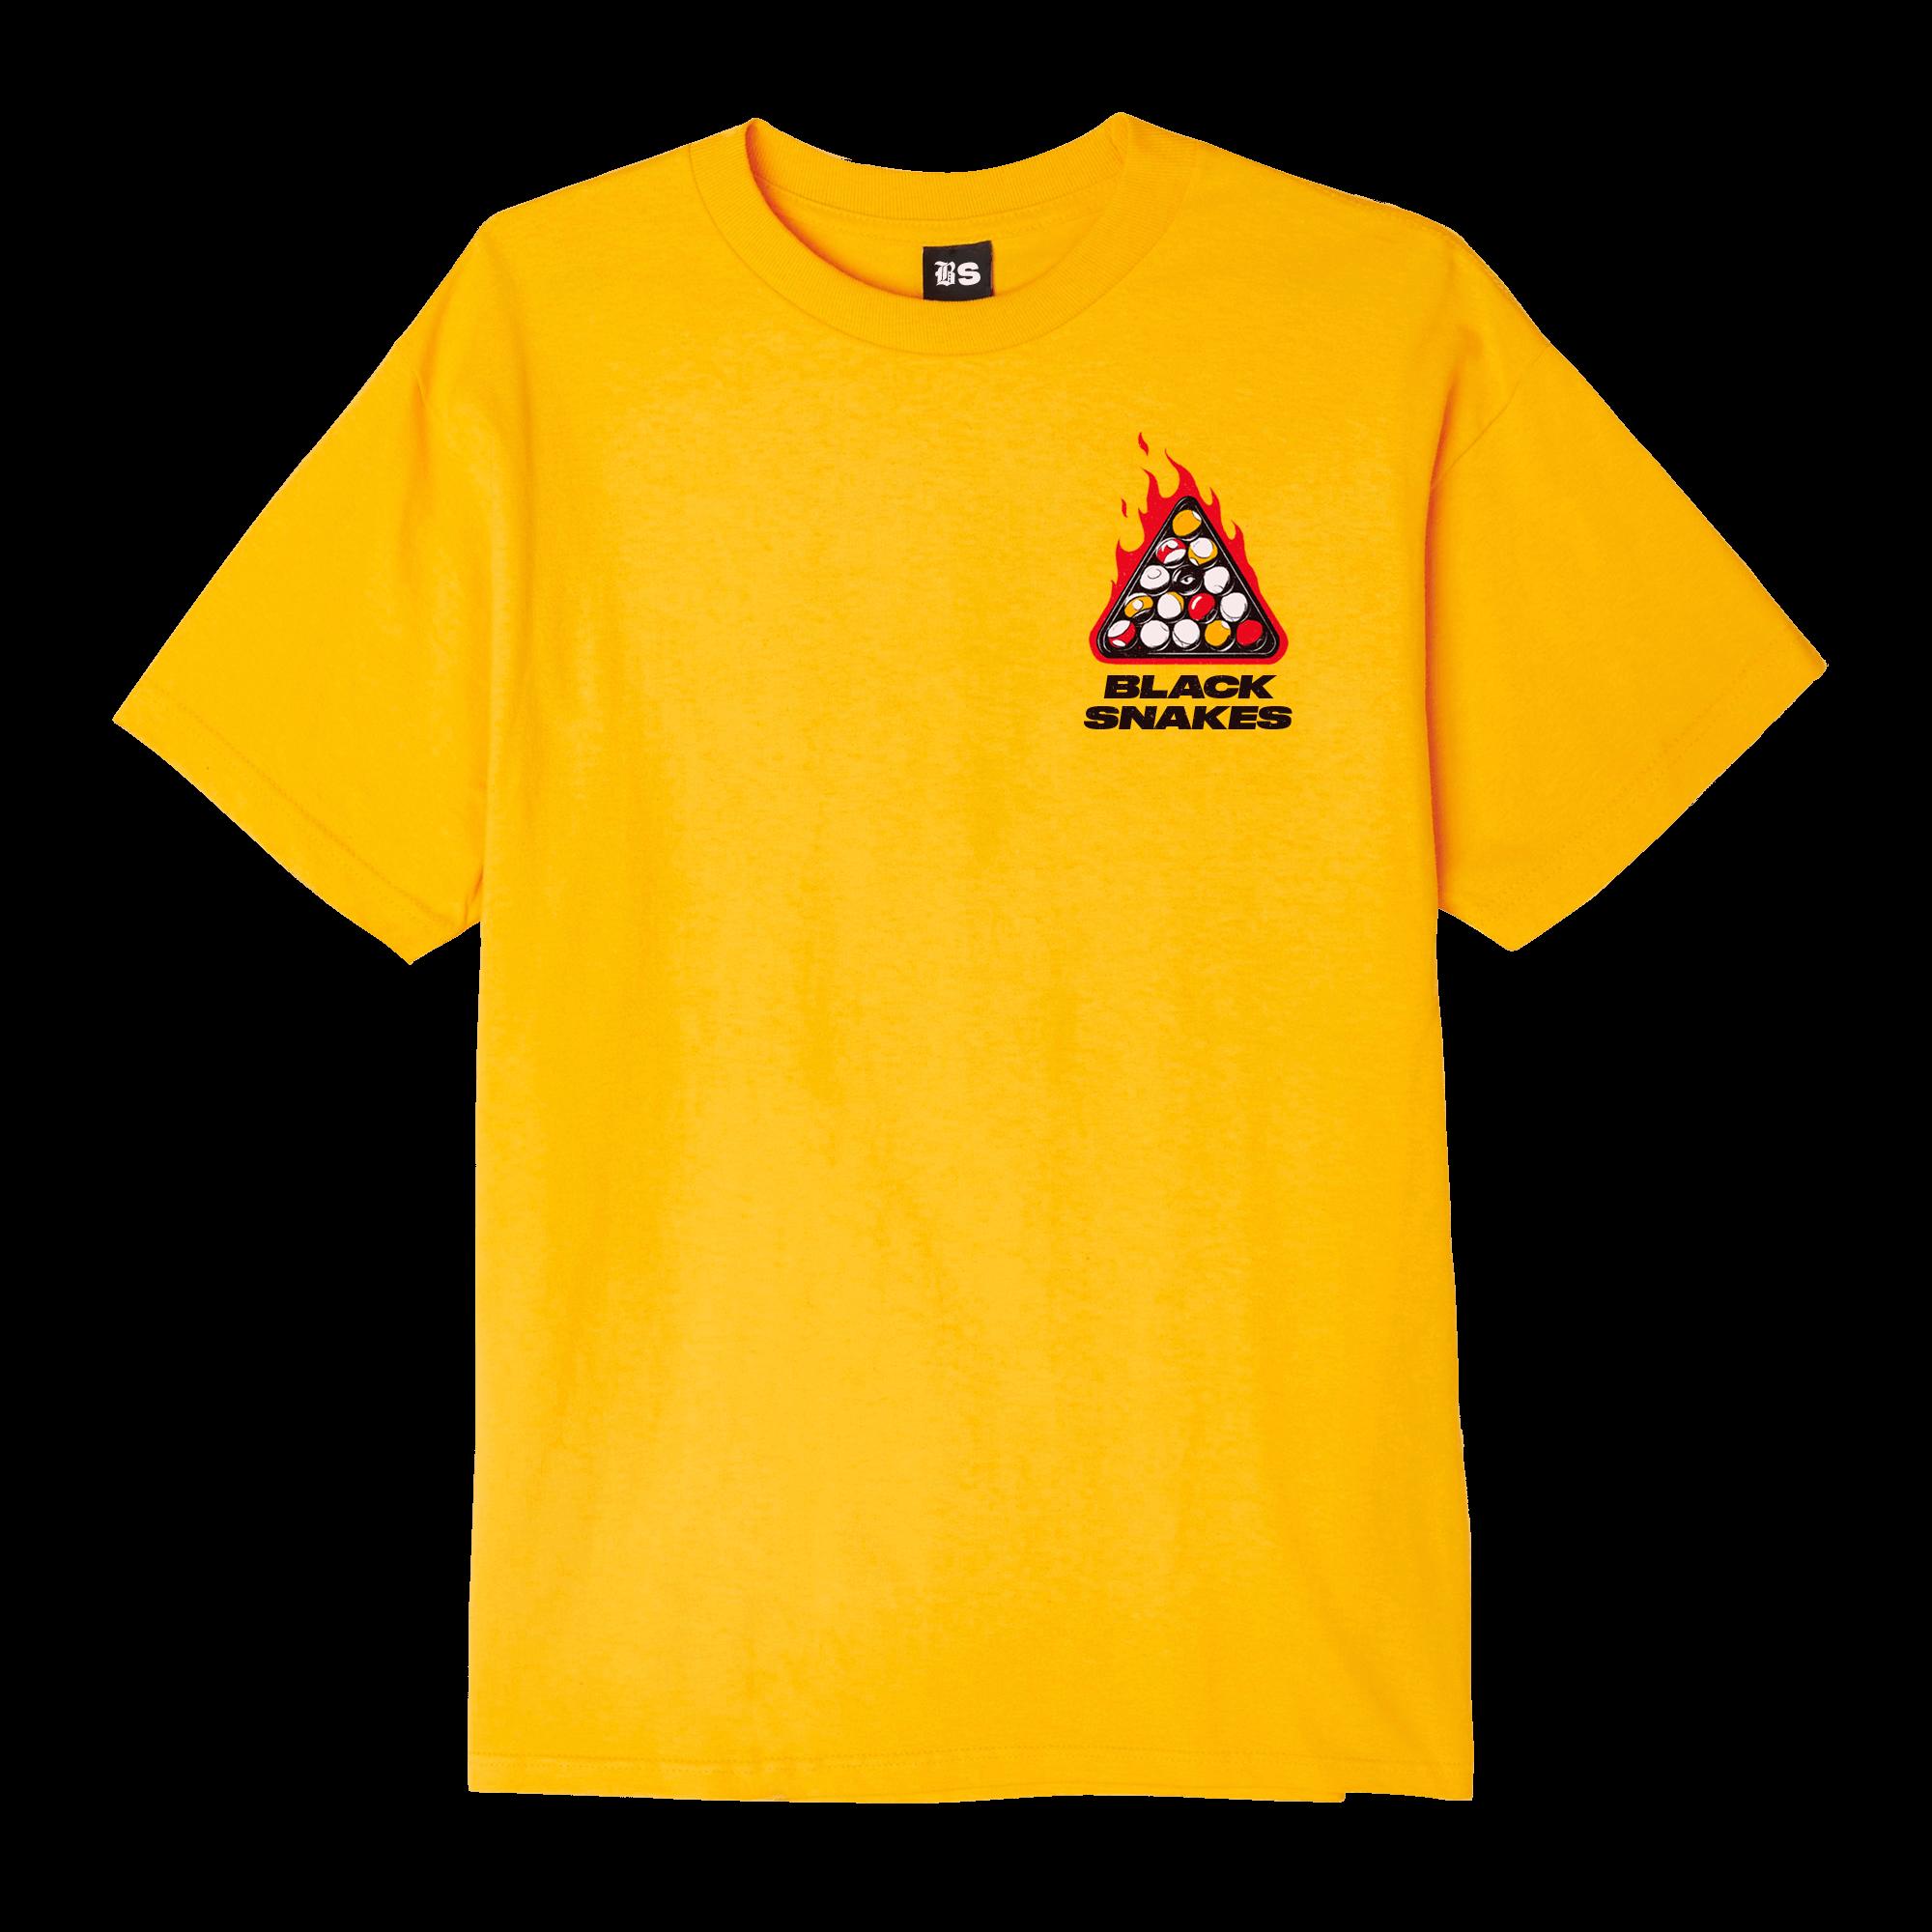 Black Snakes T-shirt design Front 1